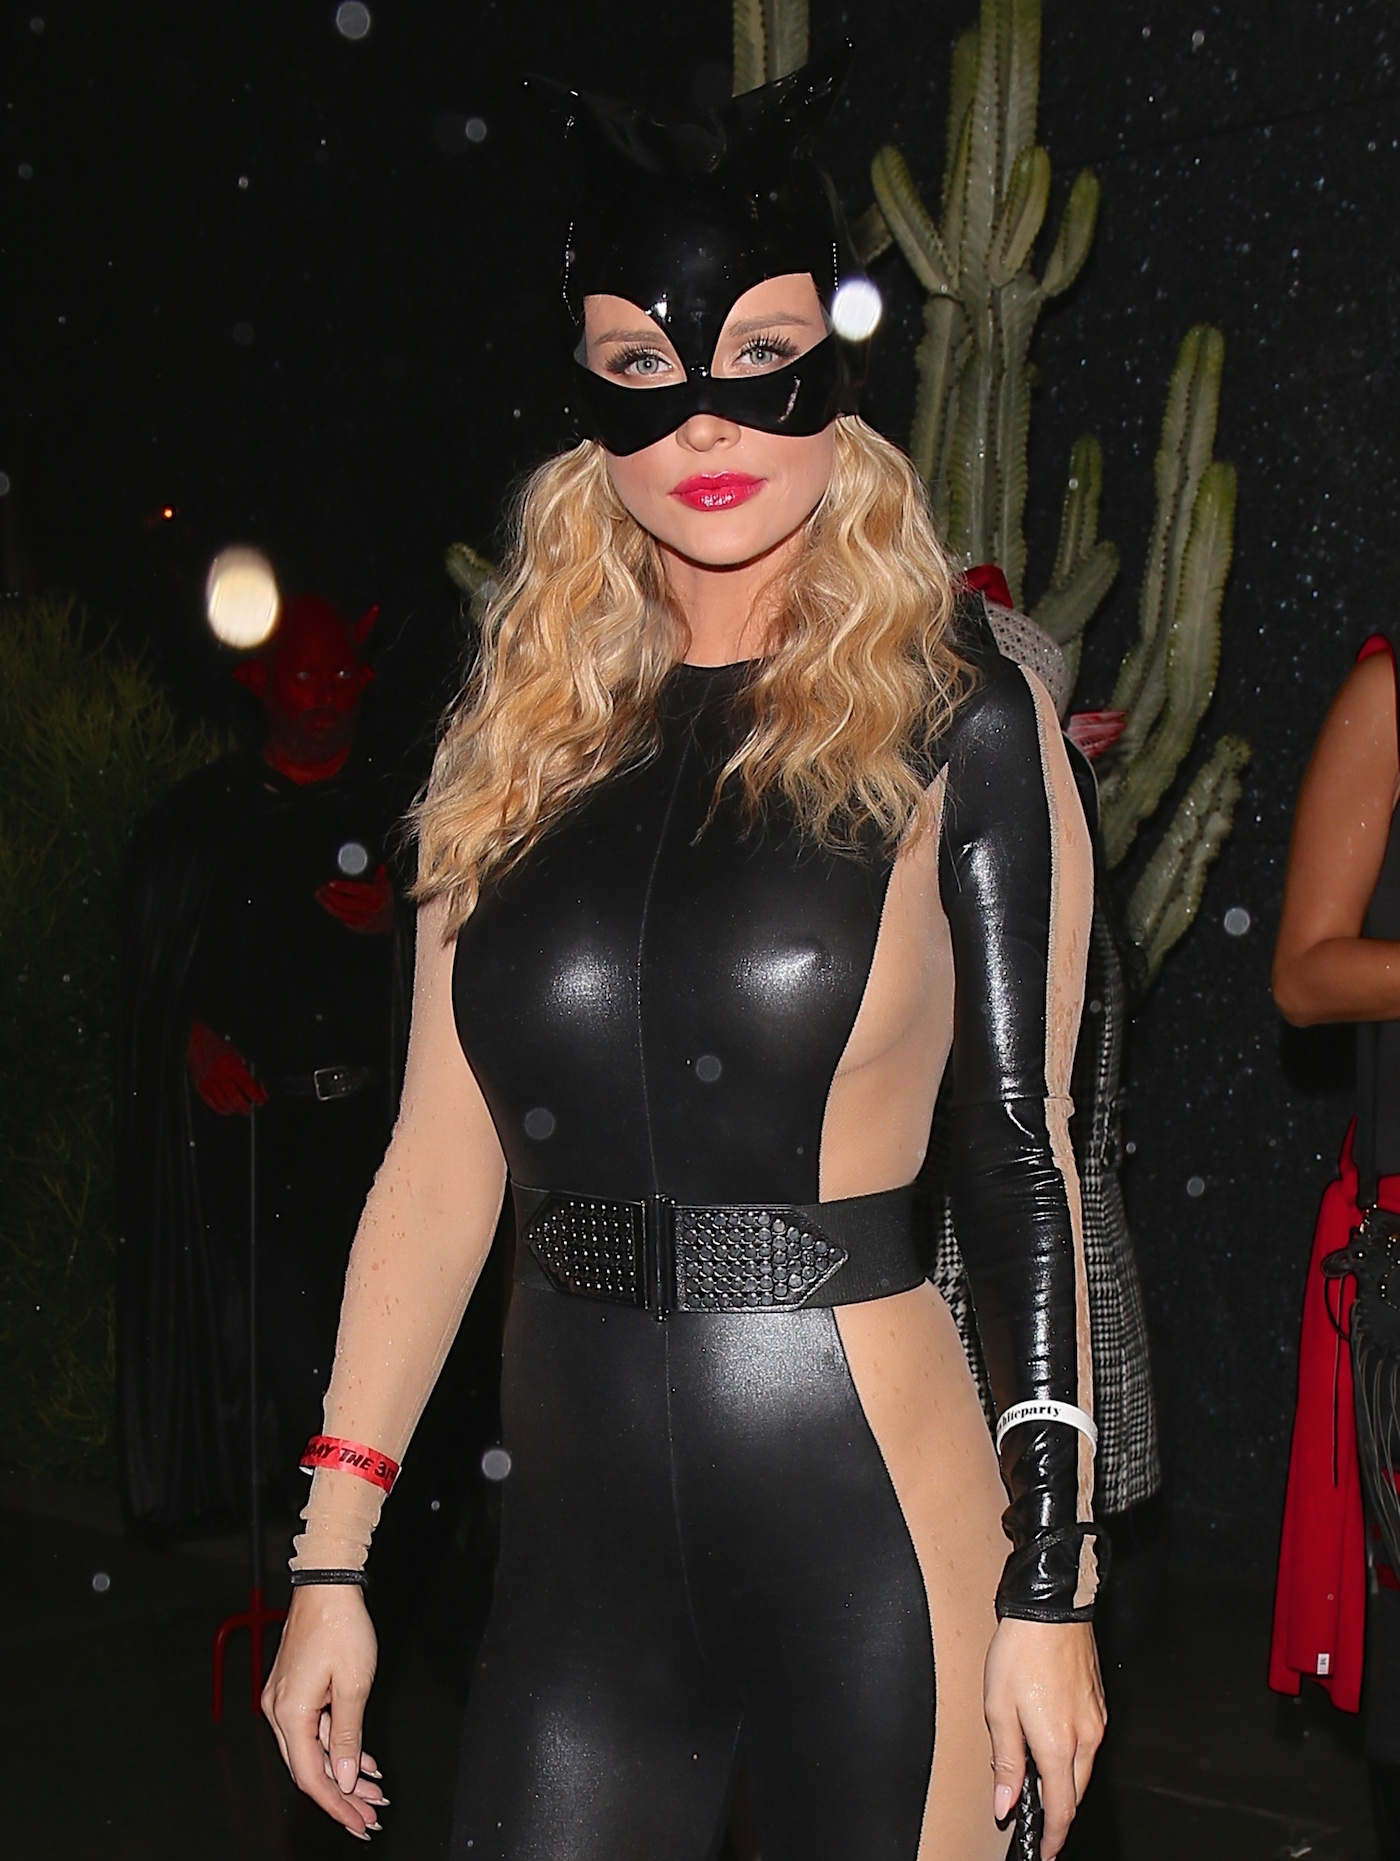 joanna-krupa-black-costume-see-through-3.jpg